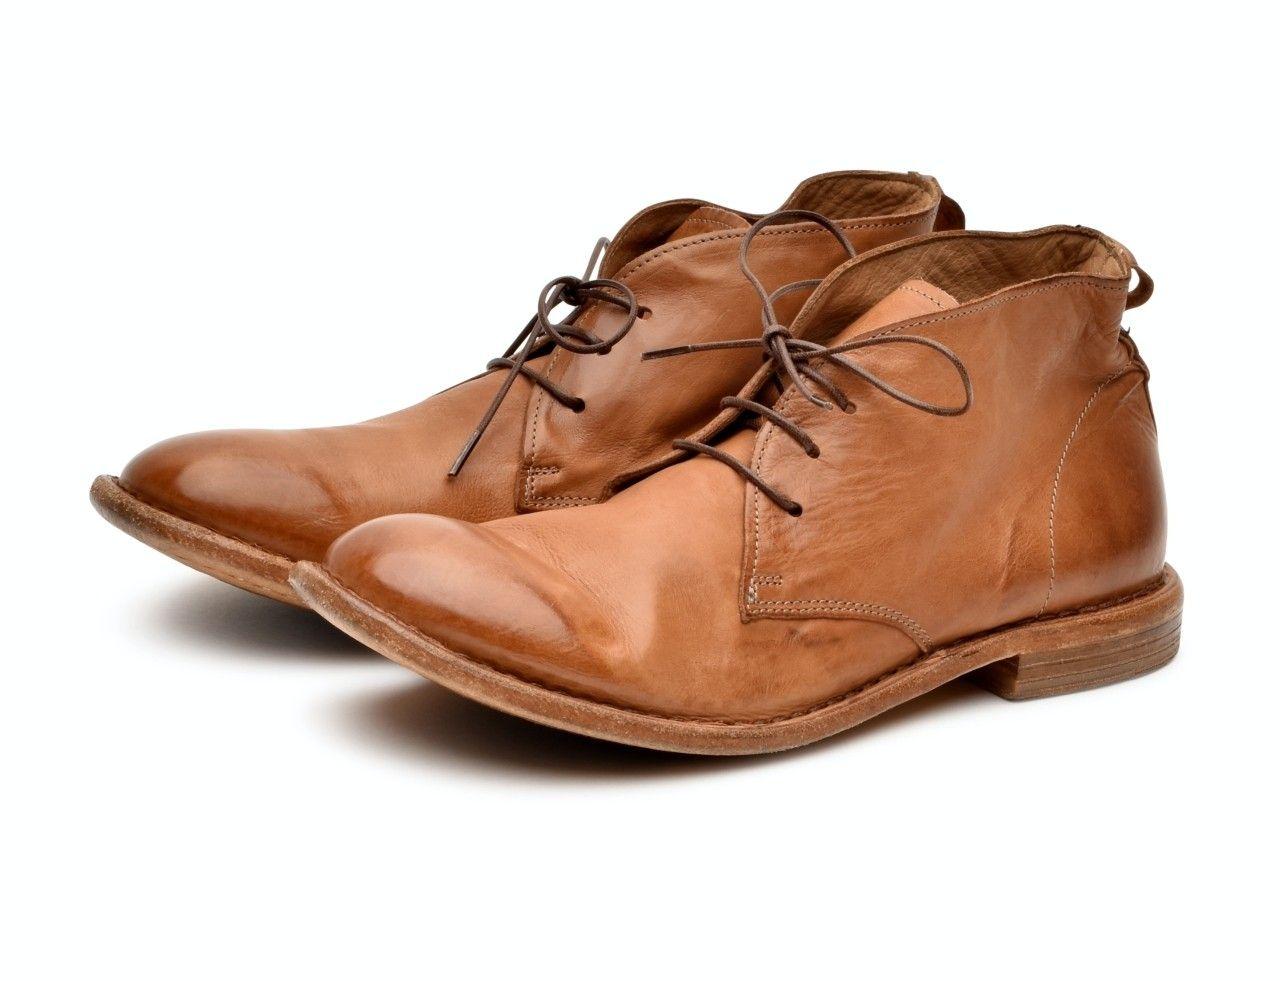 MOMA - Herren Schuh - Polacco Uomo Sombrero - Cinnamon